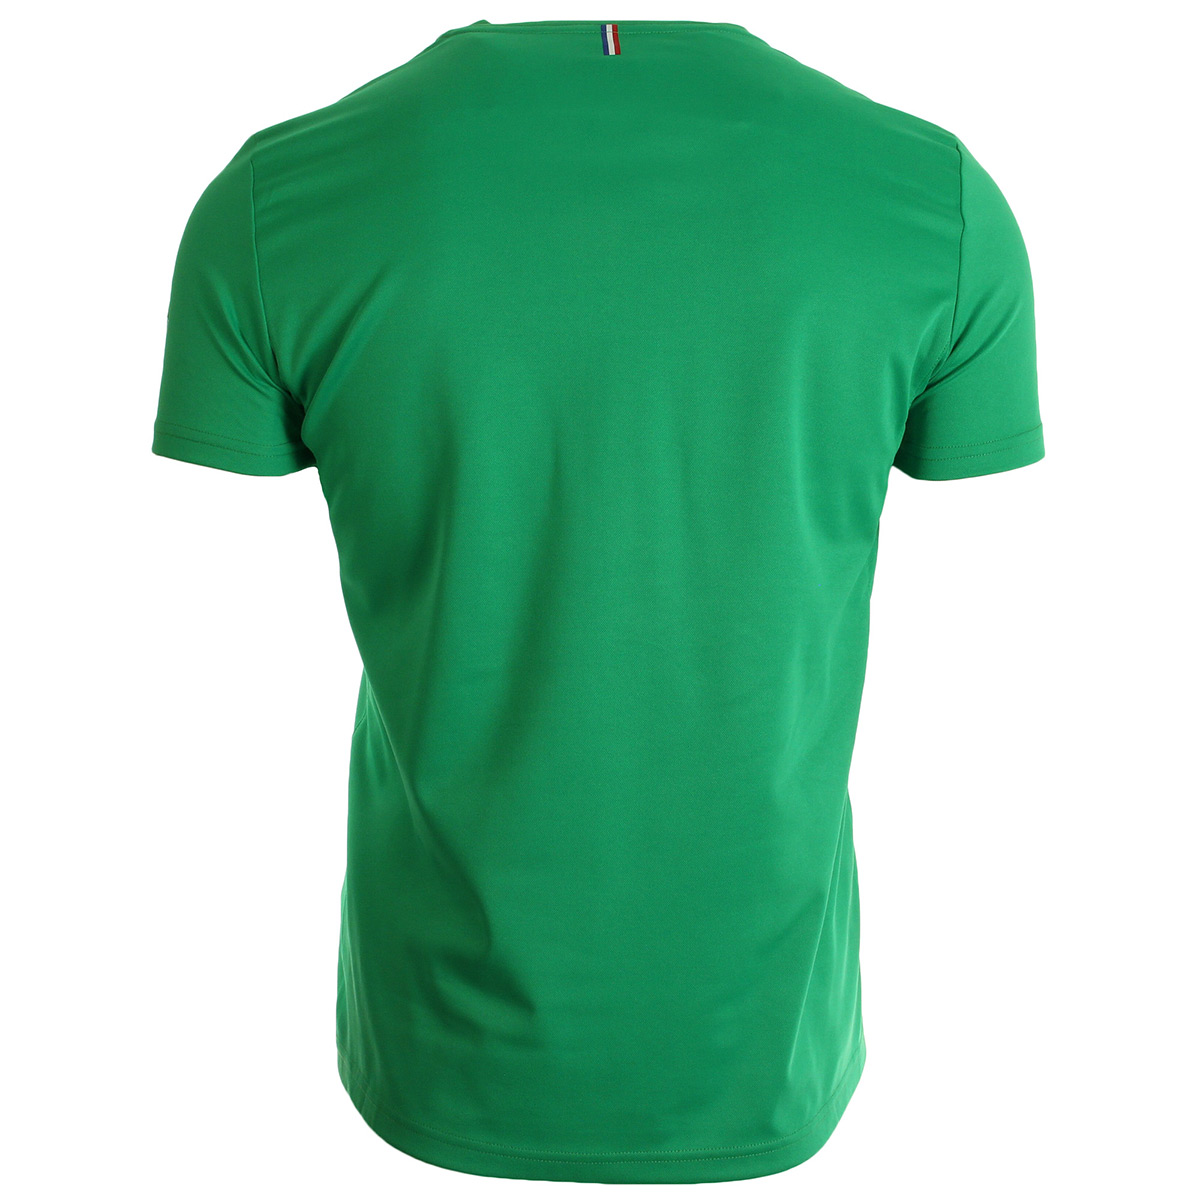 Le Coq Sportif ASSE Training T Shirt 1521852, T-Shirts homme